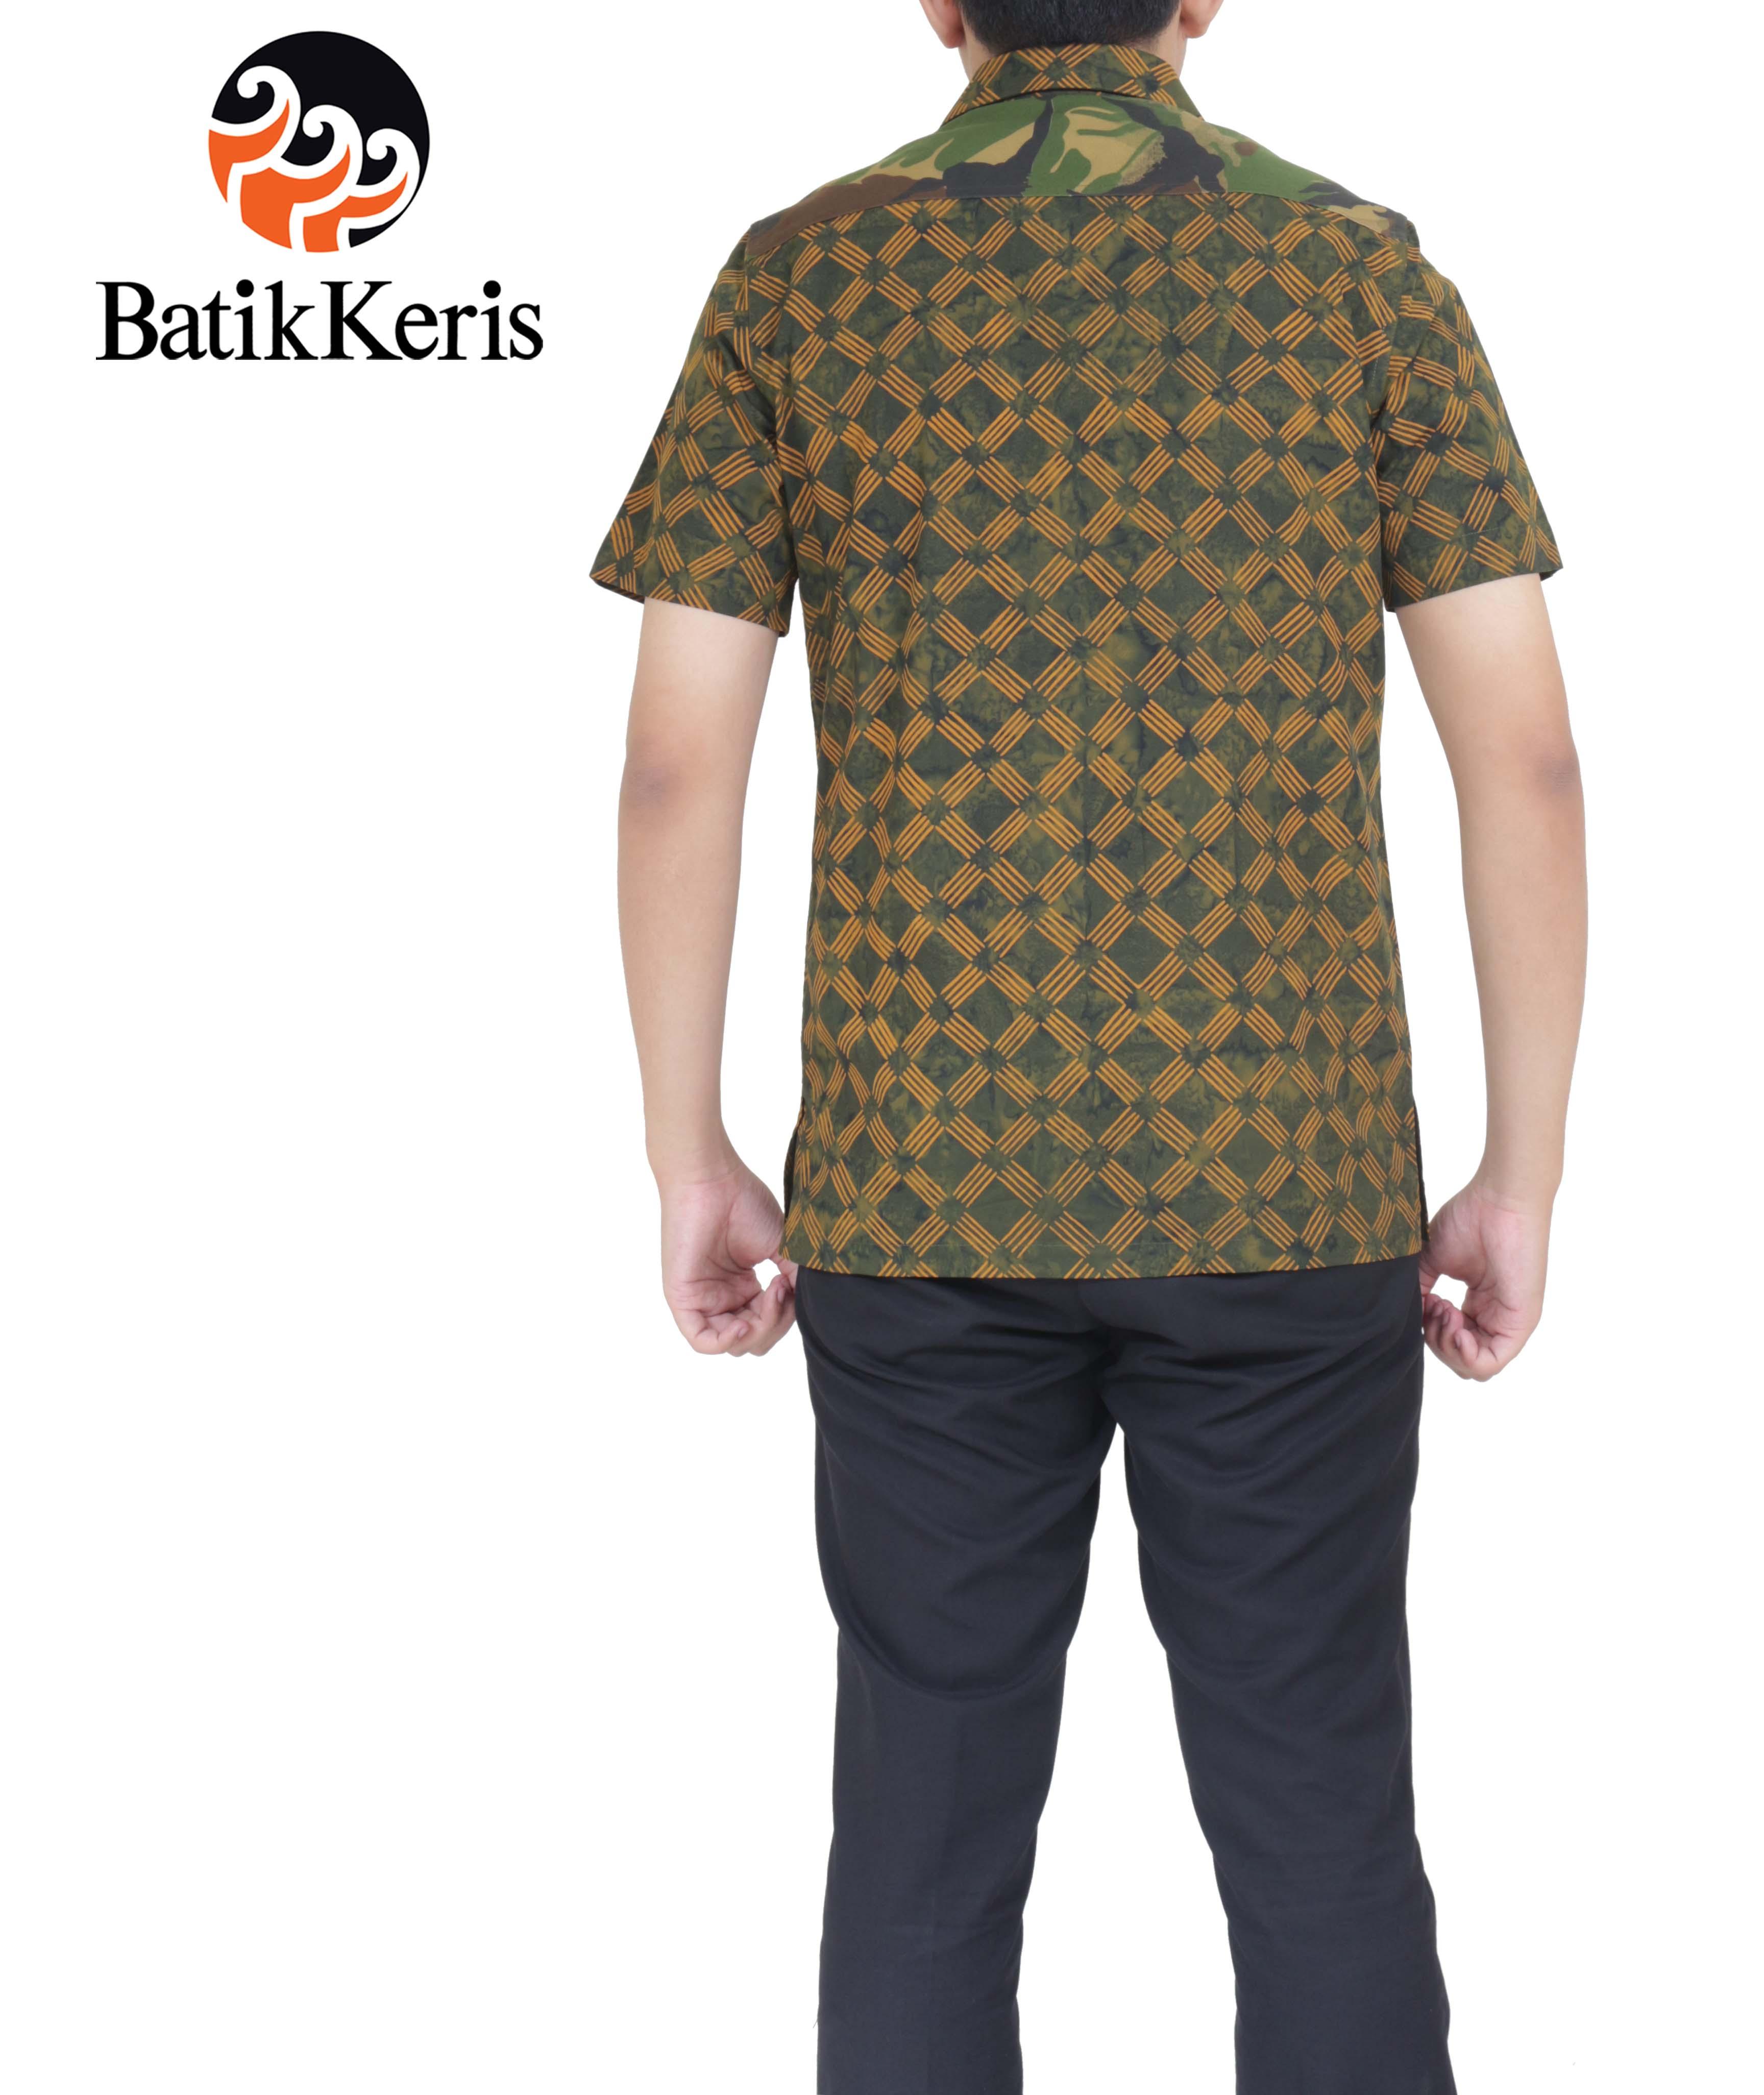 Batik Keris Solo 2017: KEMEJA BATIK SLIMFIT LENGAN PENDEK MOTIF NAMRUJI KOMBINASI